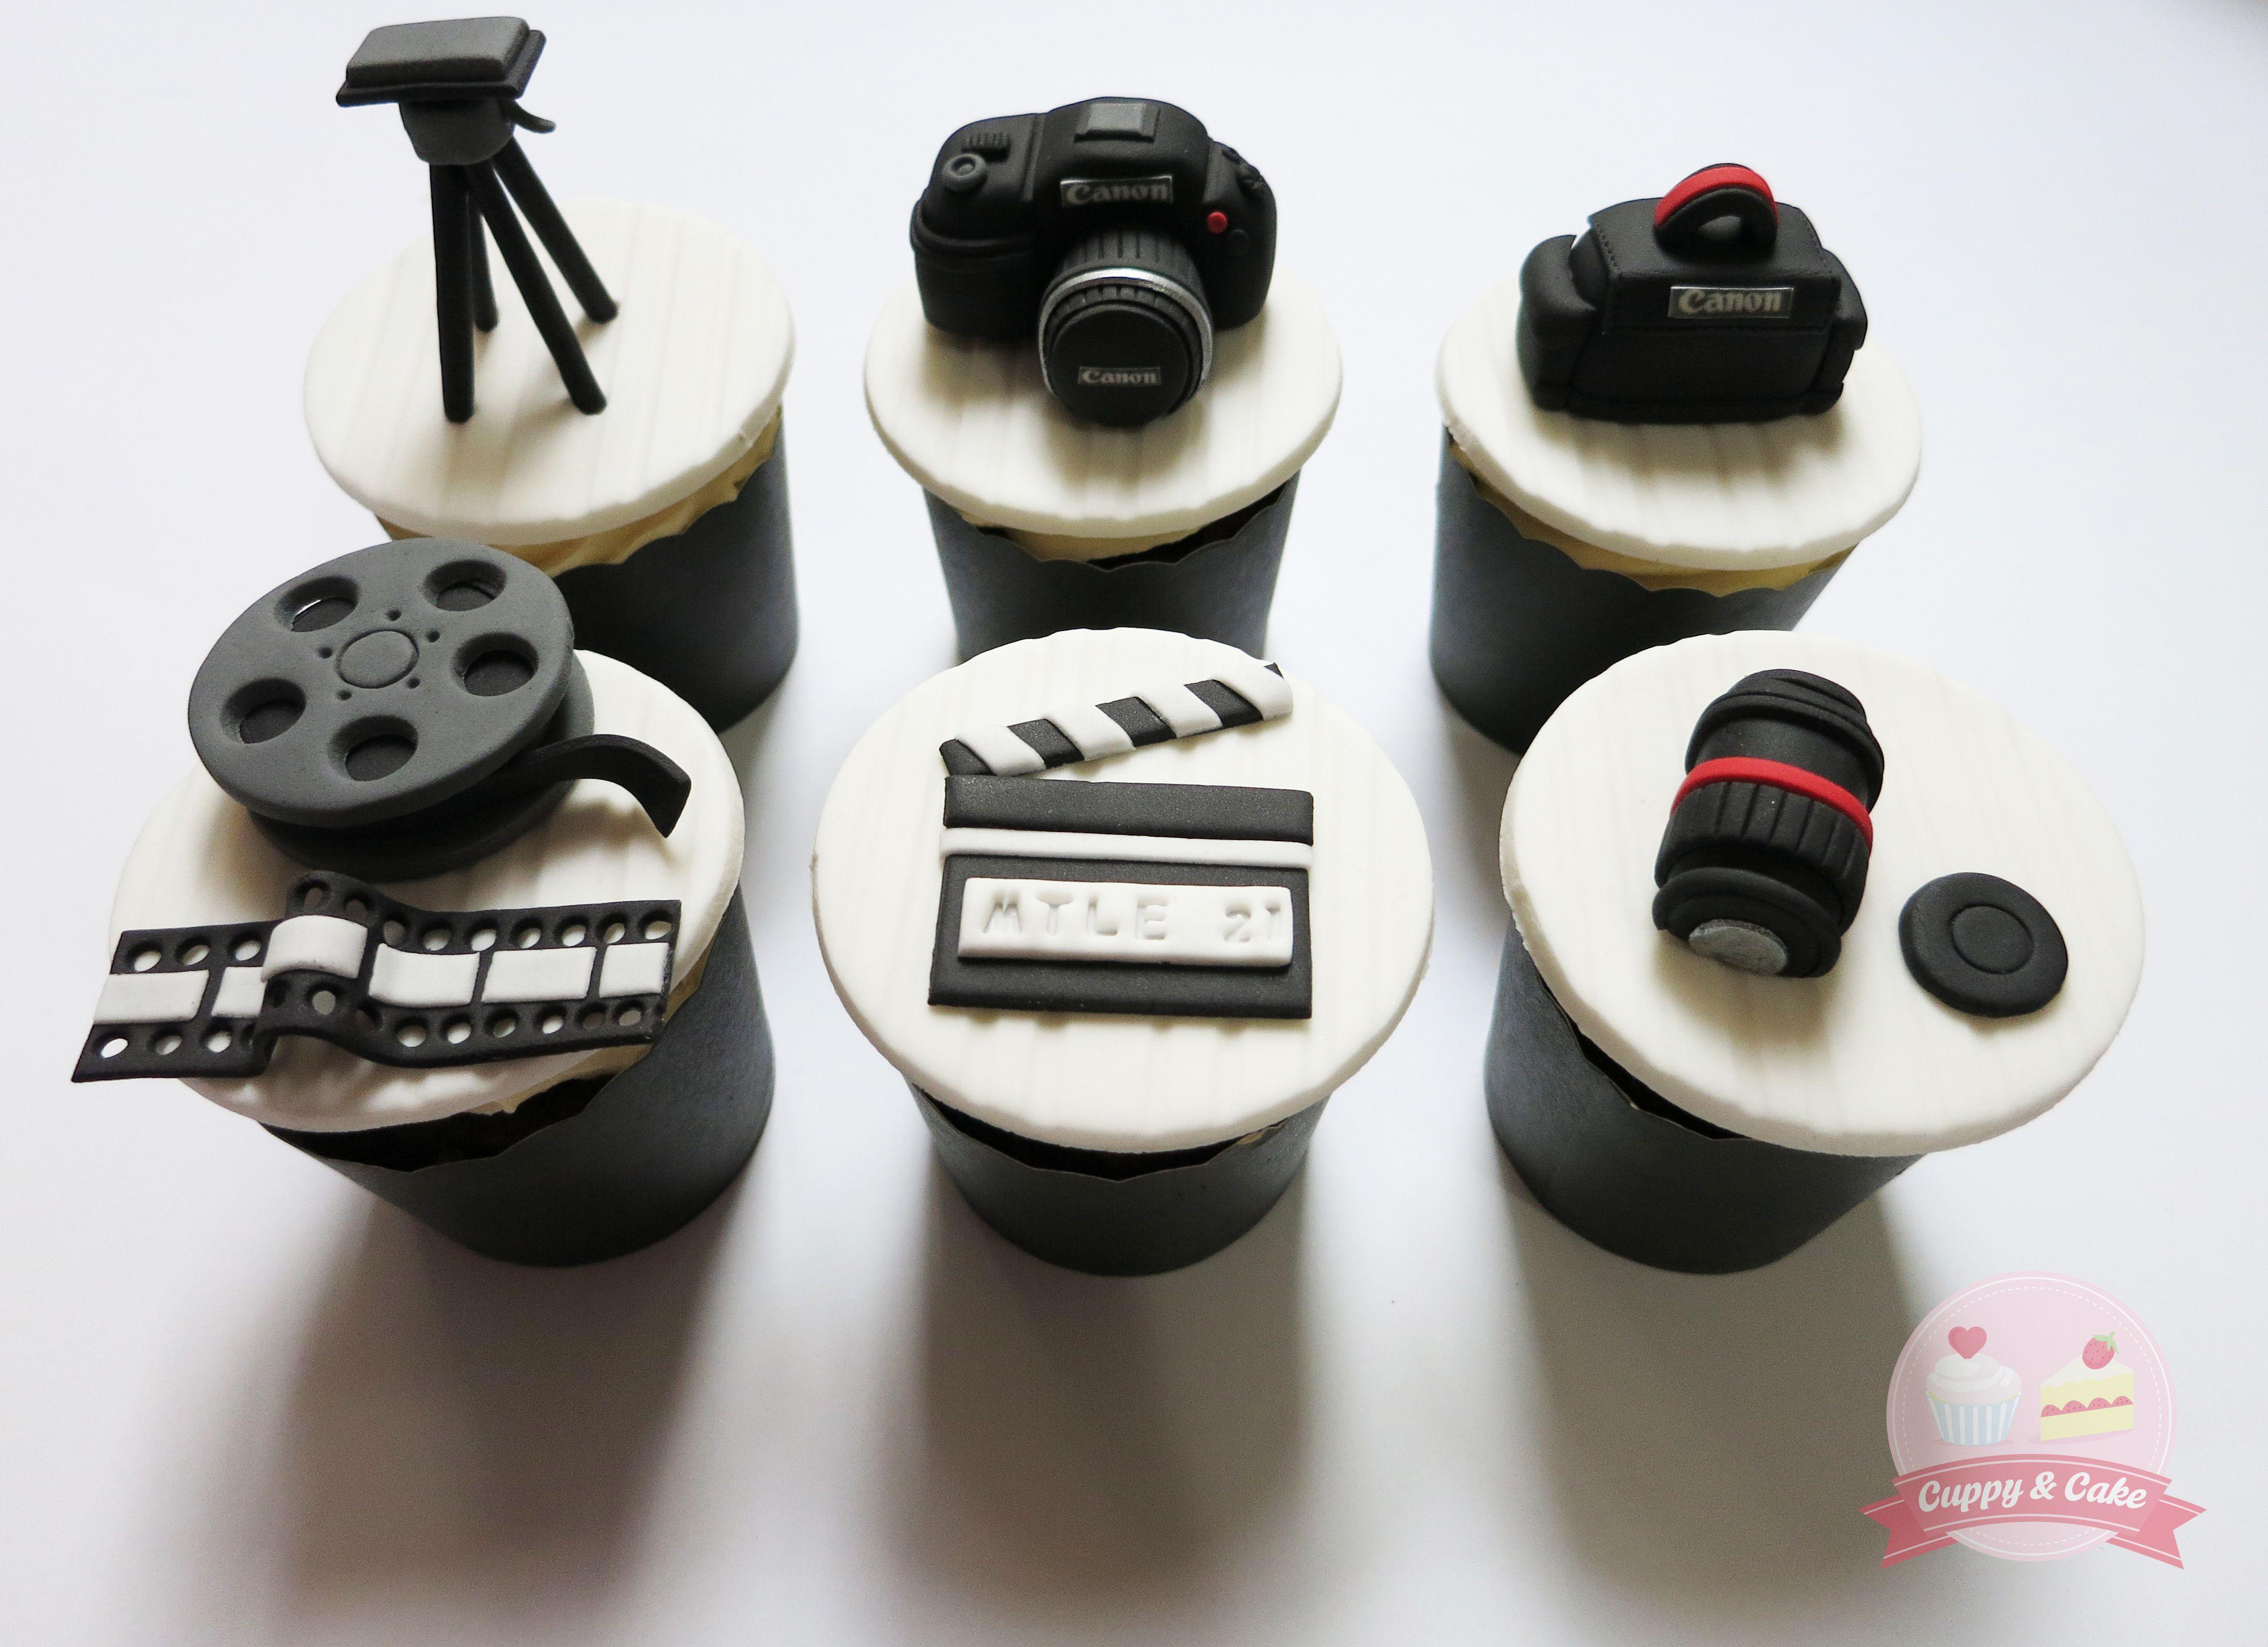 Canon Camera Cake Design : Canon camera themed cupcakes #cuppyandcake #canon #camera ...